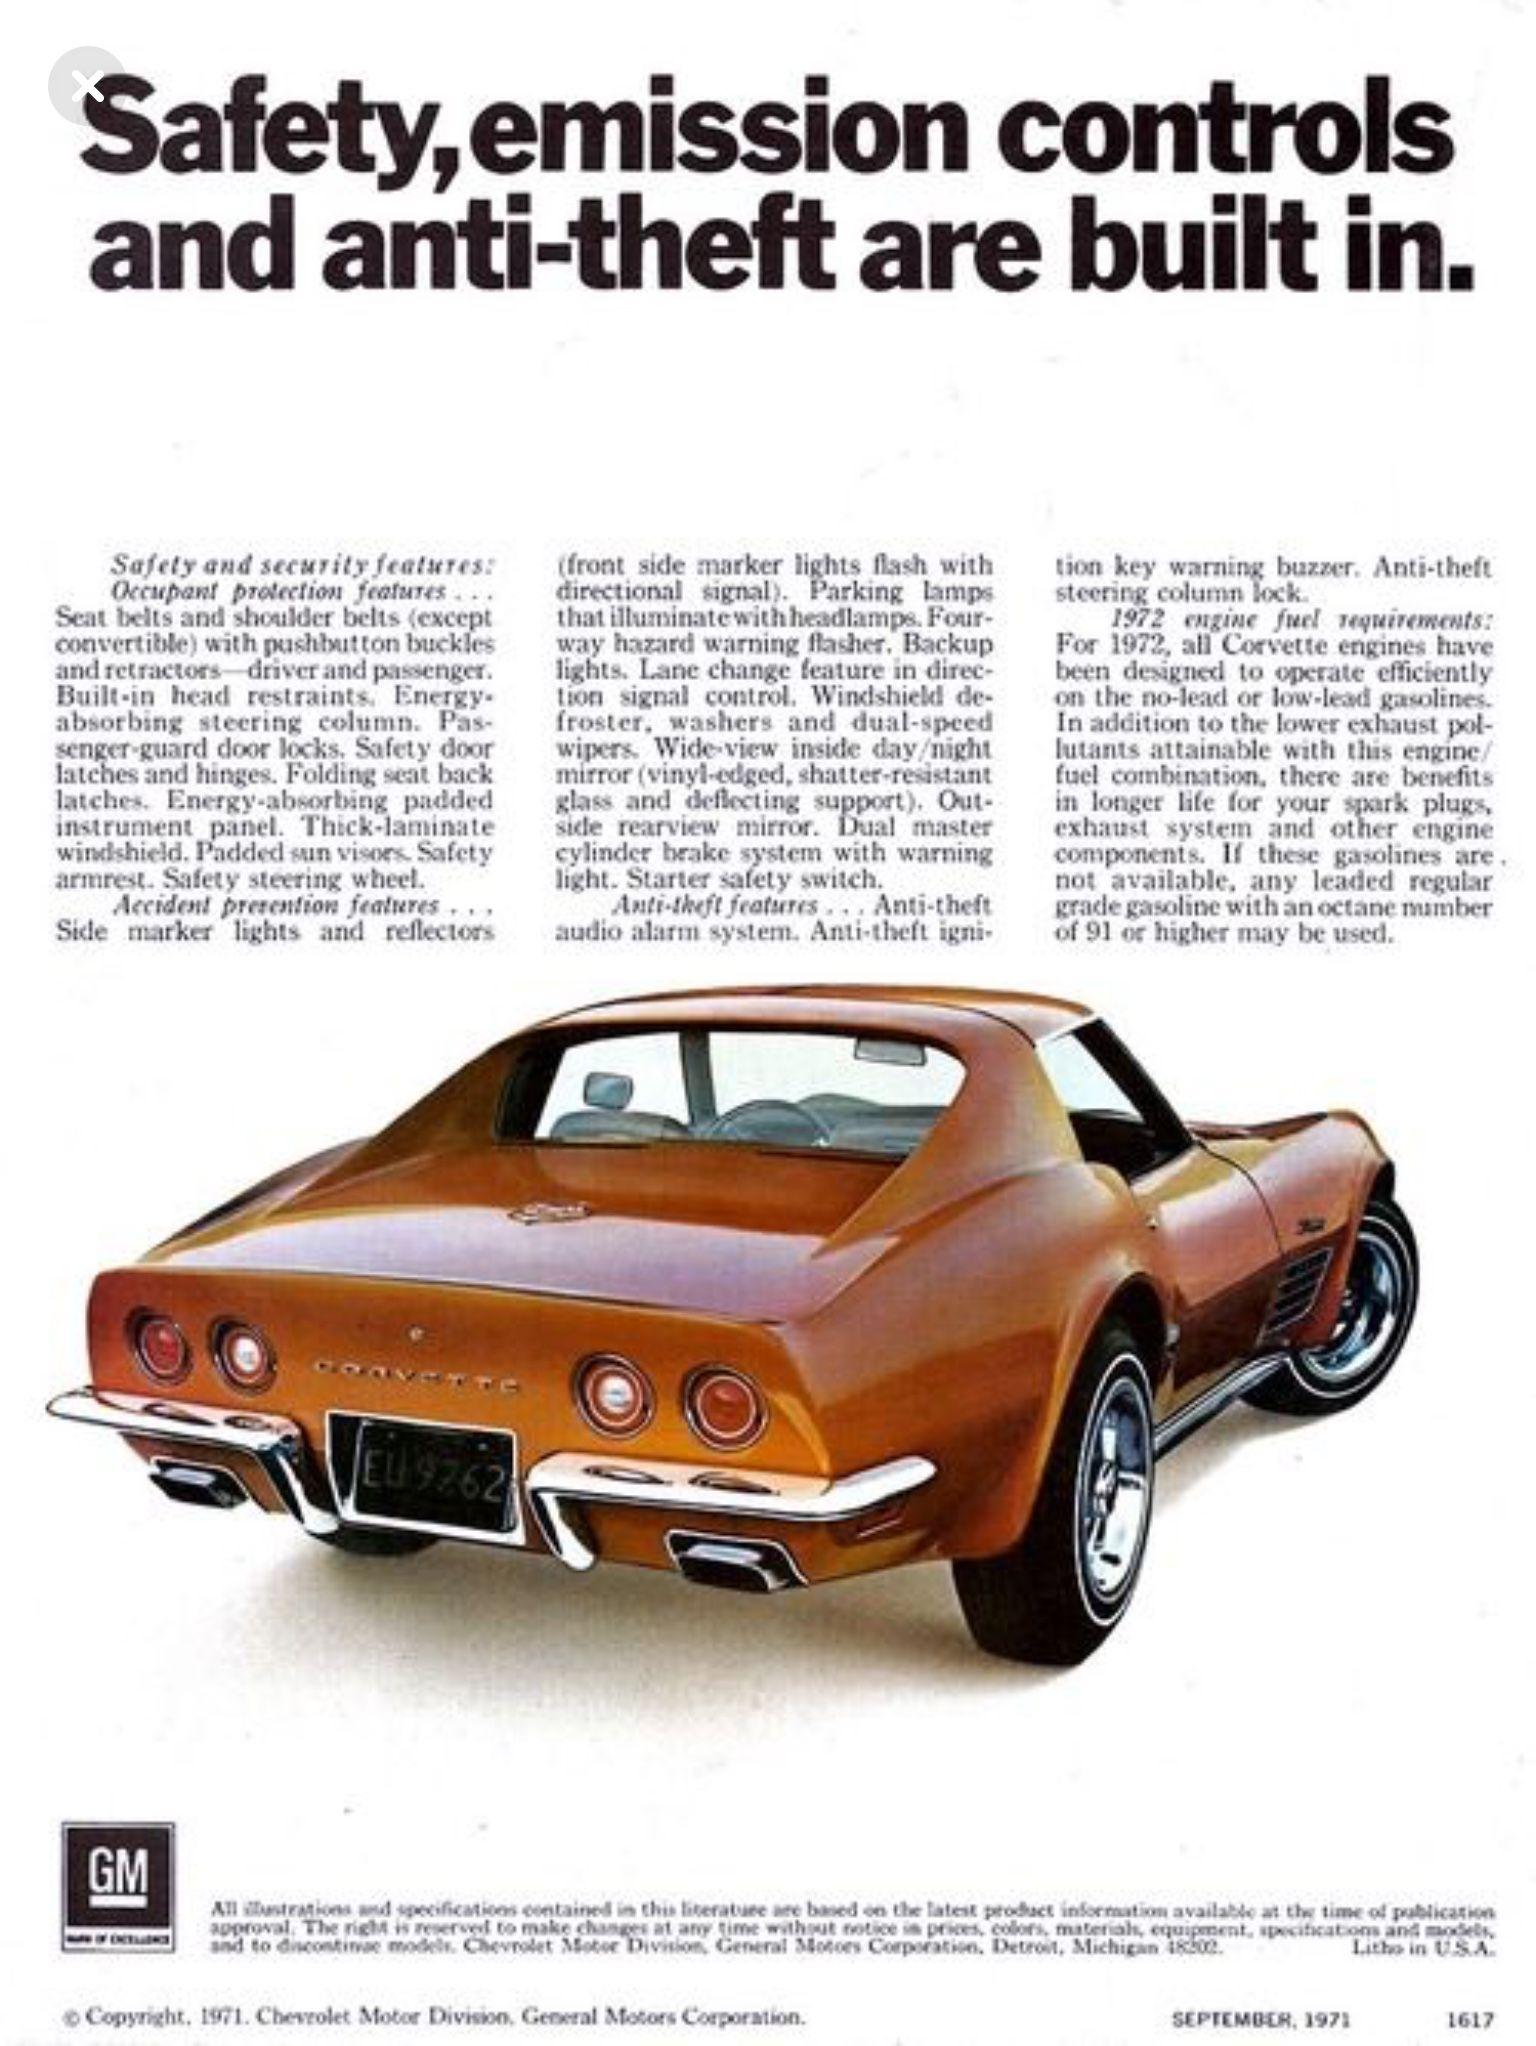 1972 Chevrolet Corvette Corvette Vintage Corvette Automobile Advertising